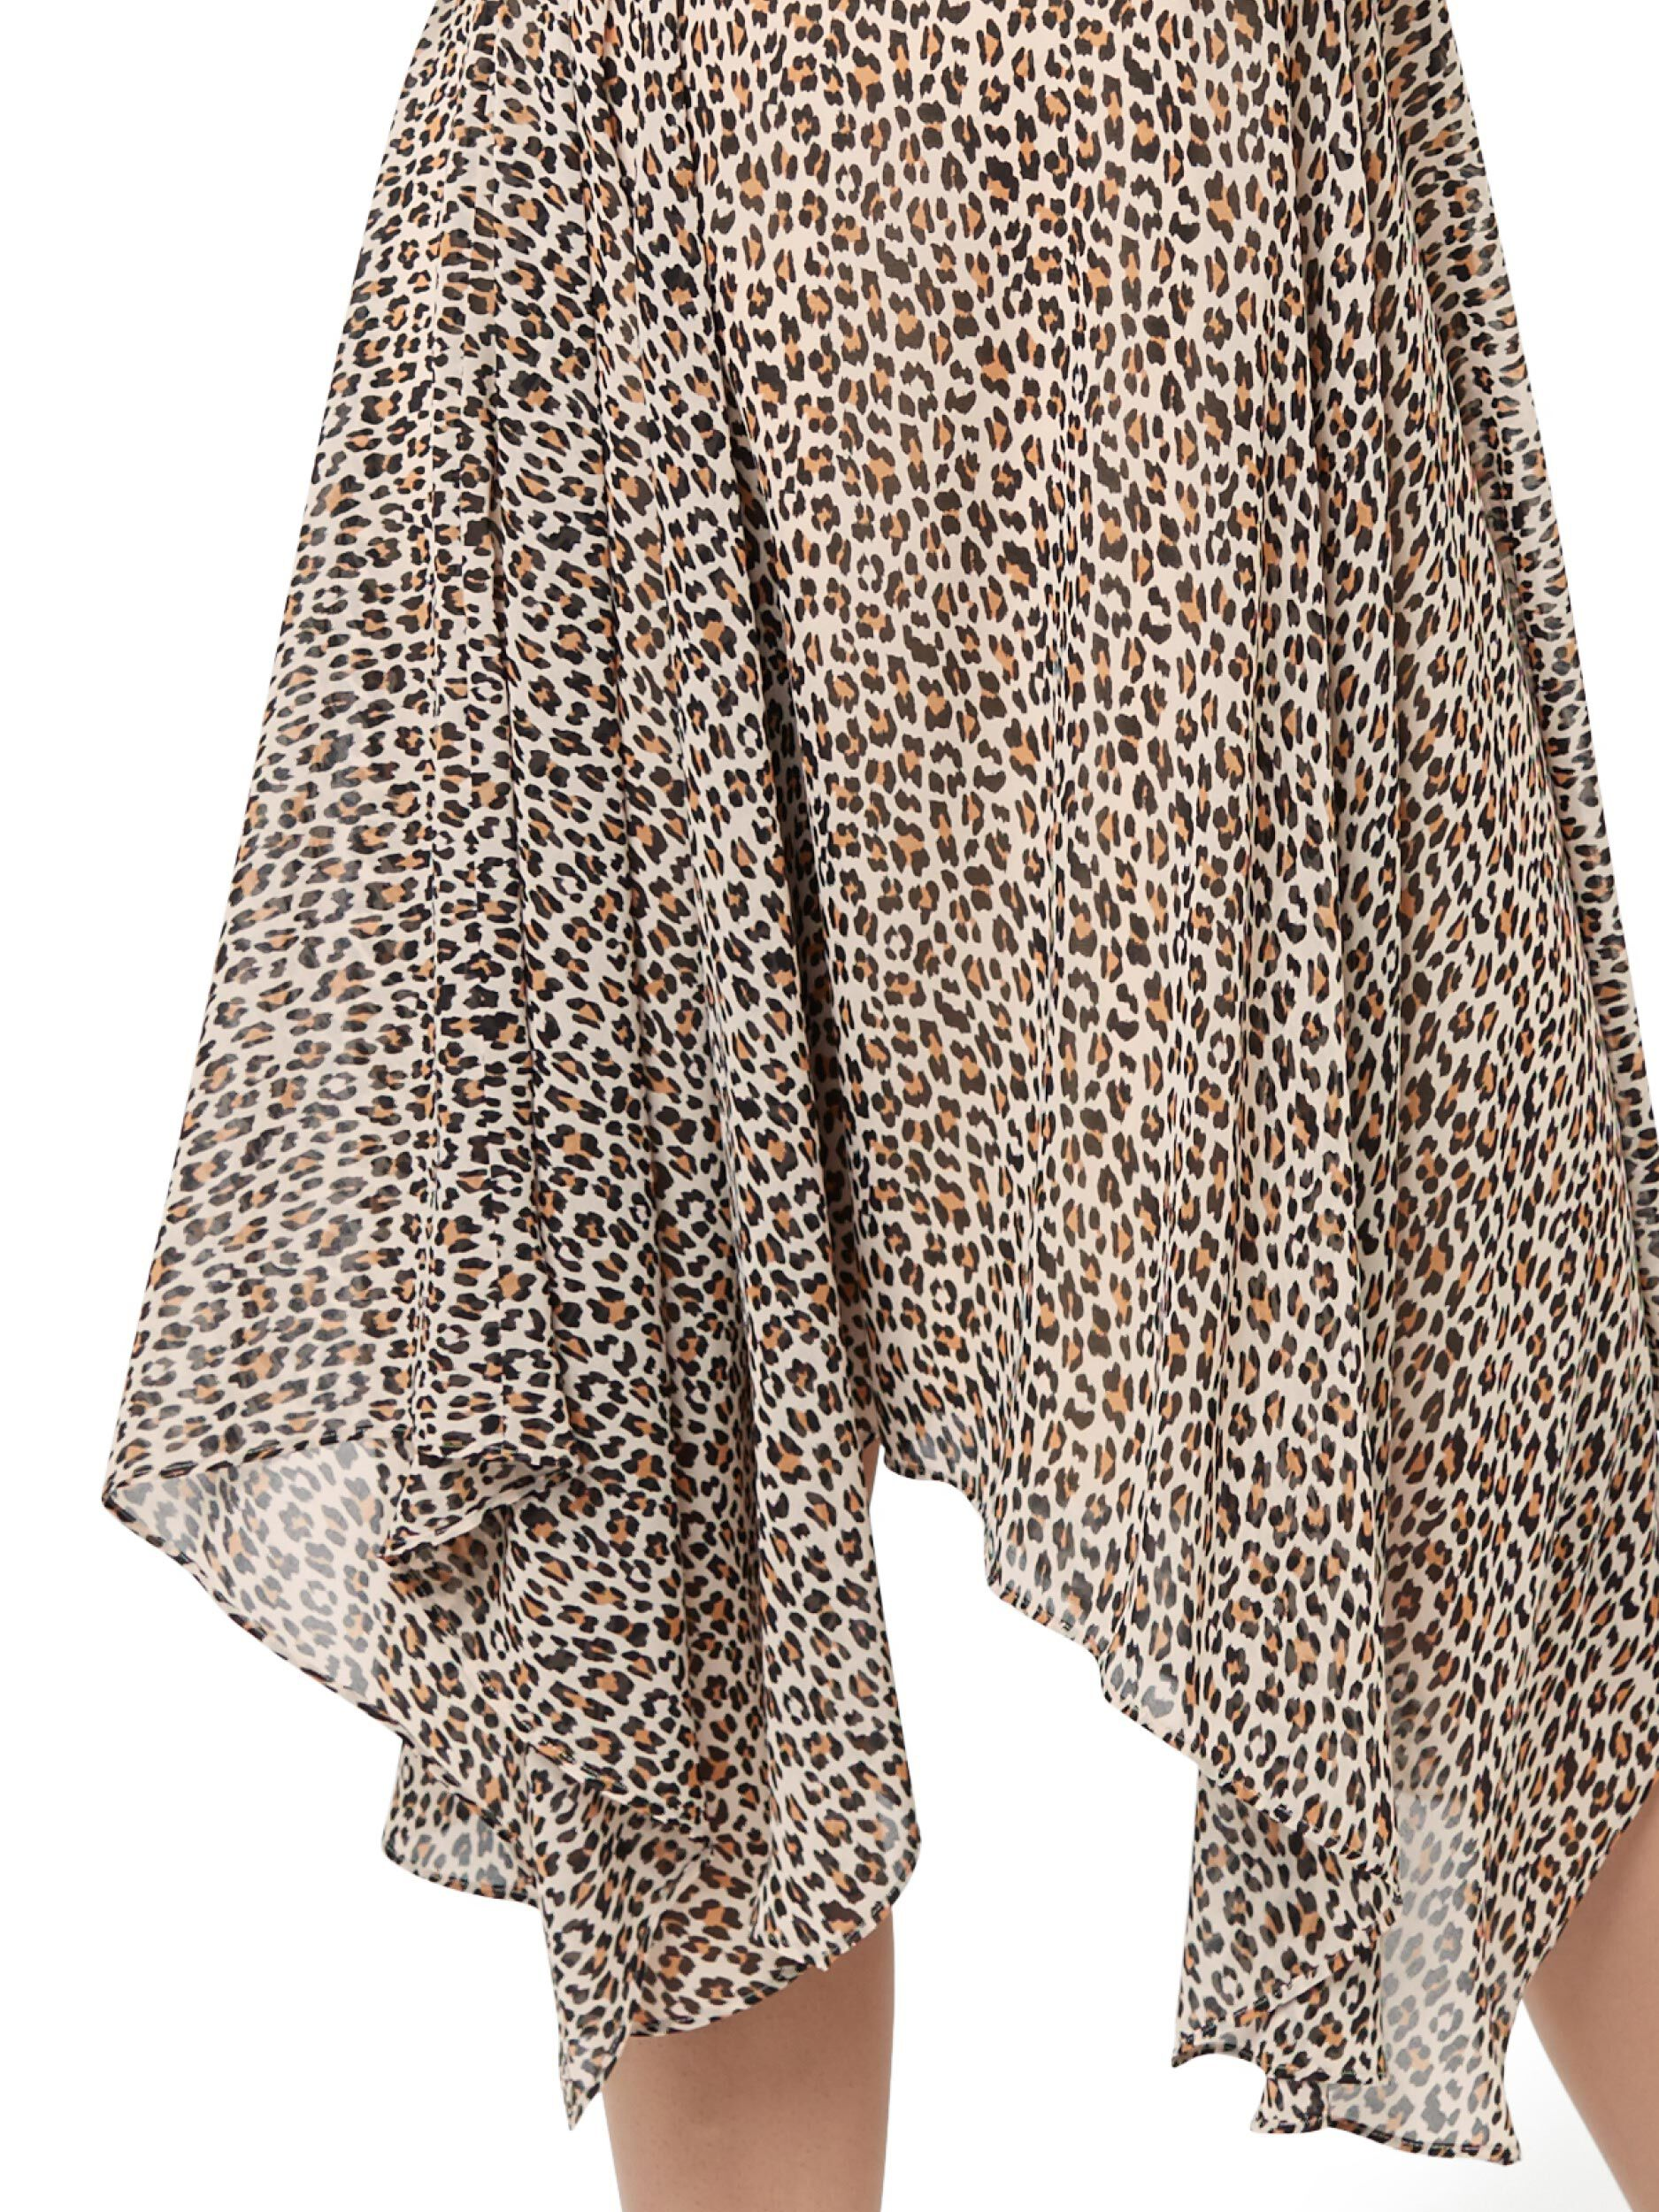 Oh Meow Dress